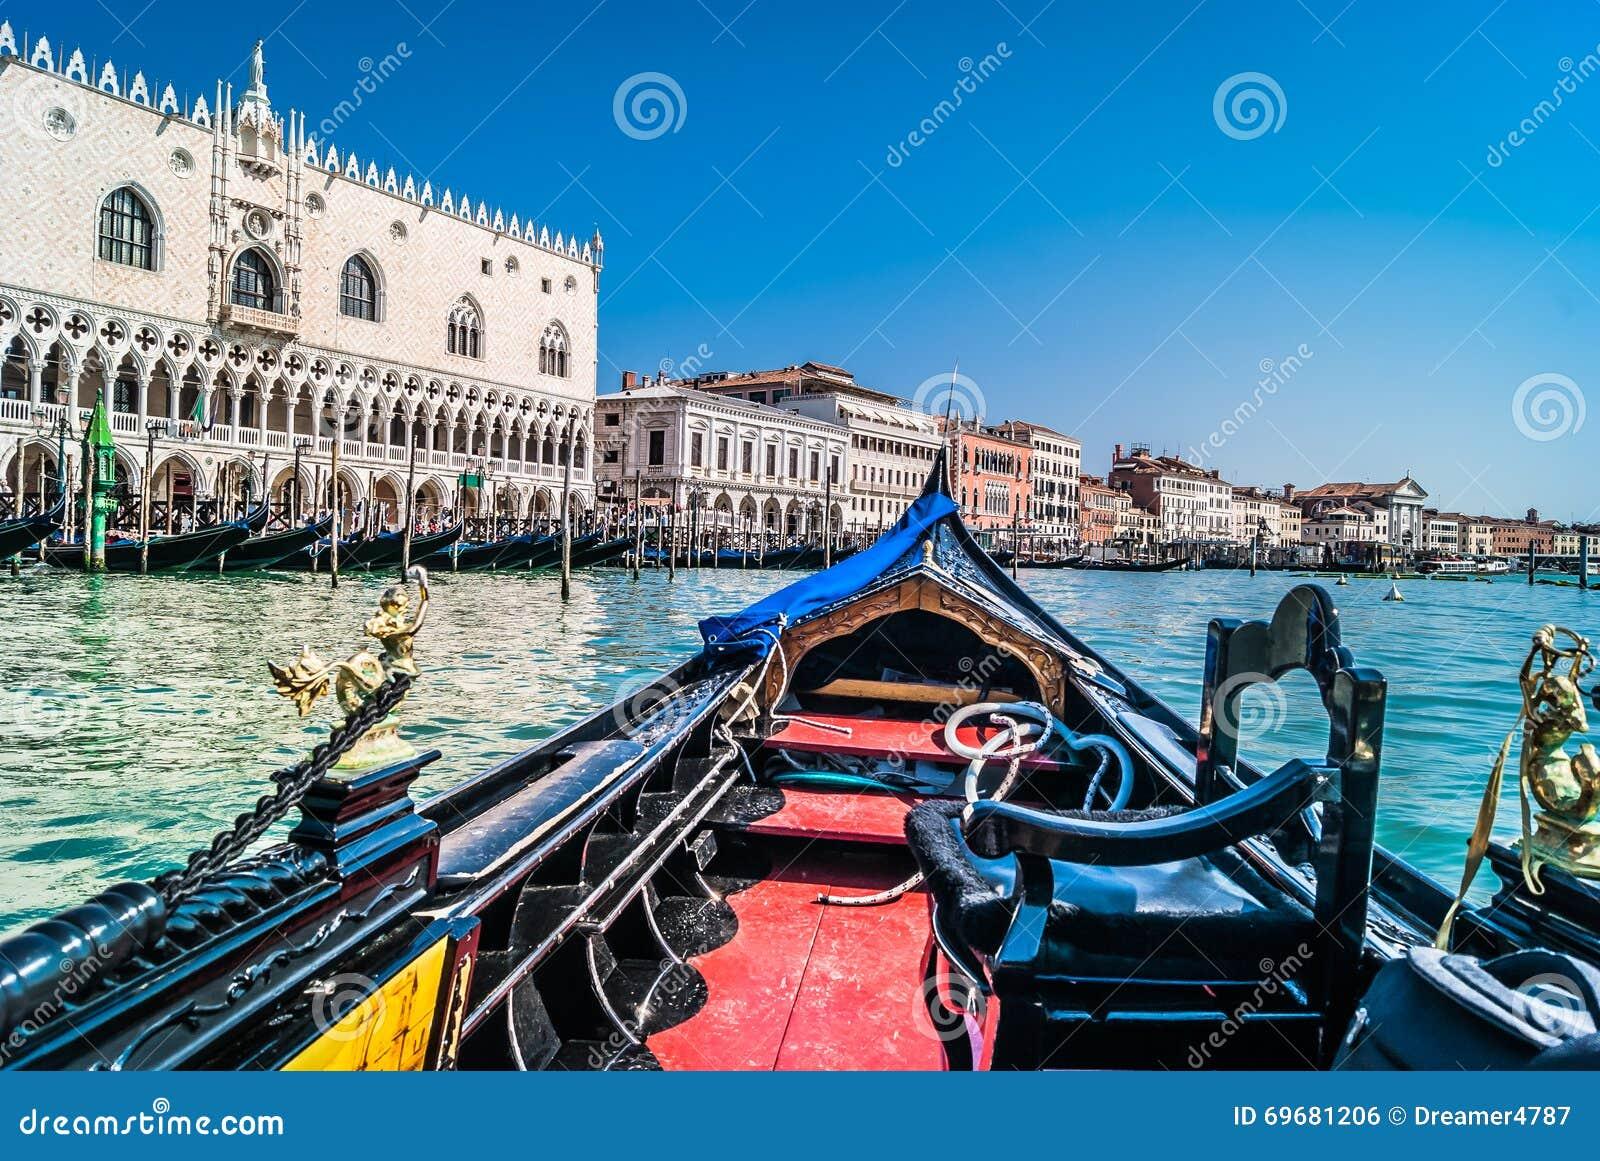 Venedig-Stadtbild von der Gondel, Italien